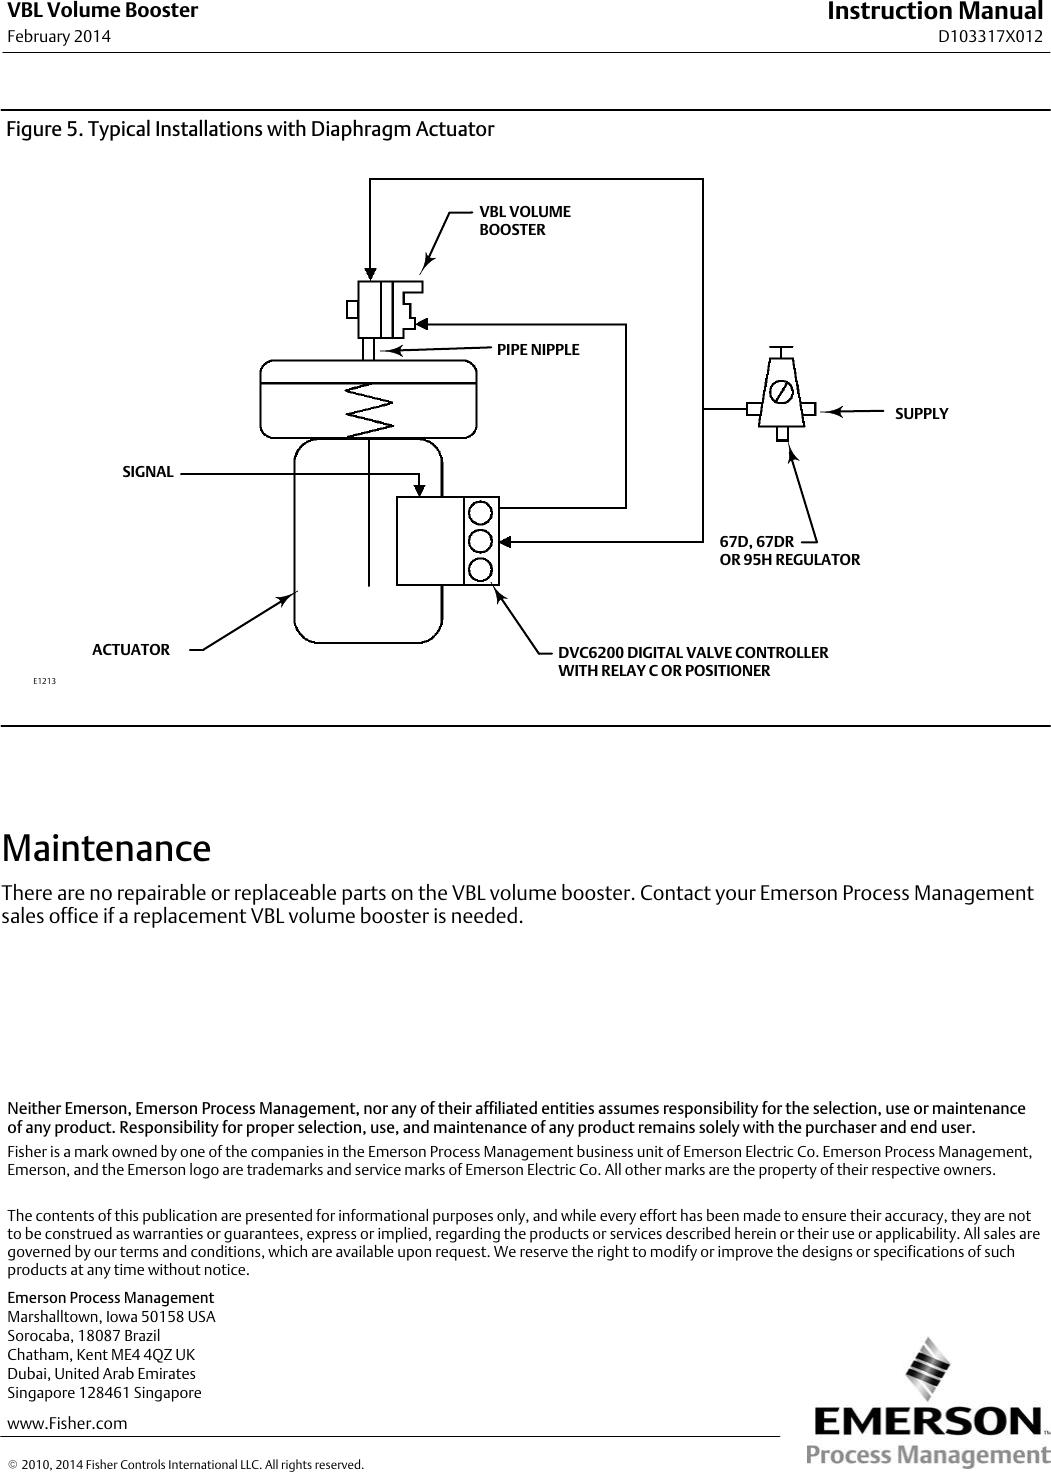 Emerson user Manual